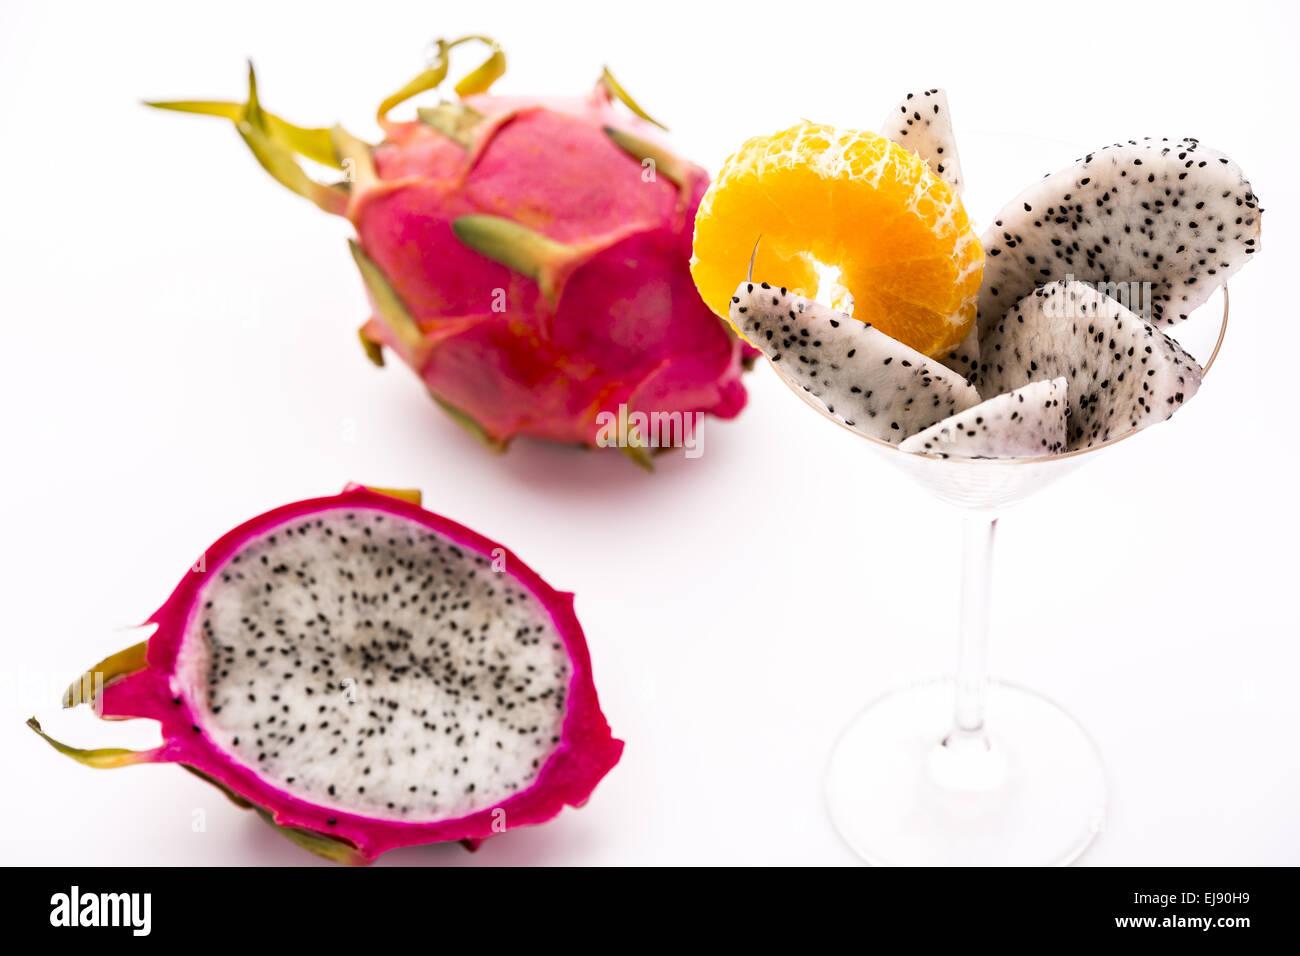 Vibrant purple fruit with white pulp: Pitaya - Stock Image